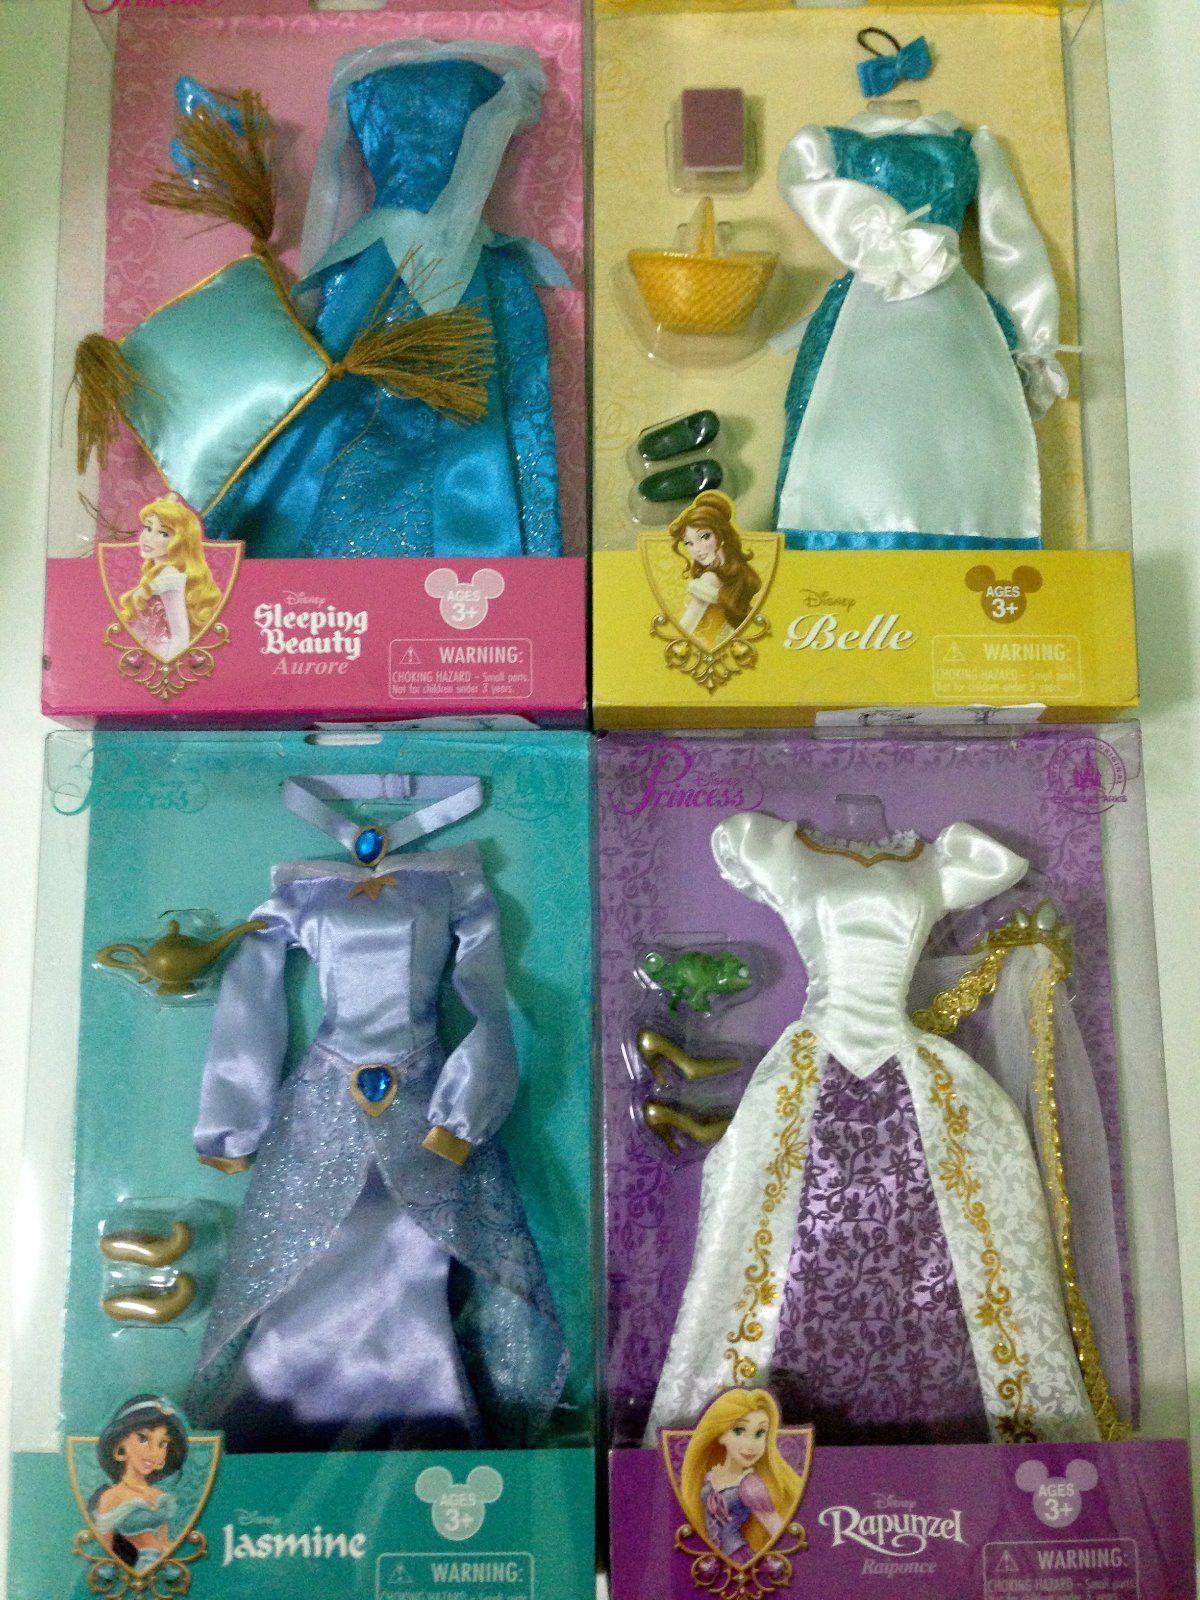 Custom Handmade Barbie Clothing: Disney Princess Doll Costume Set Dolls Outfit12 Rapunzel Jasmine Belle Aurora -> BUY IT NOW ONLY: $79.9 on eBay!